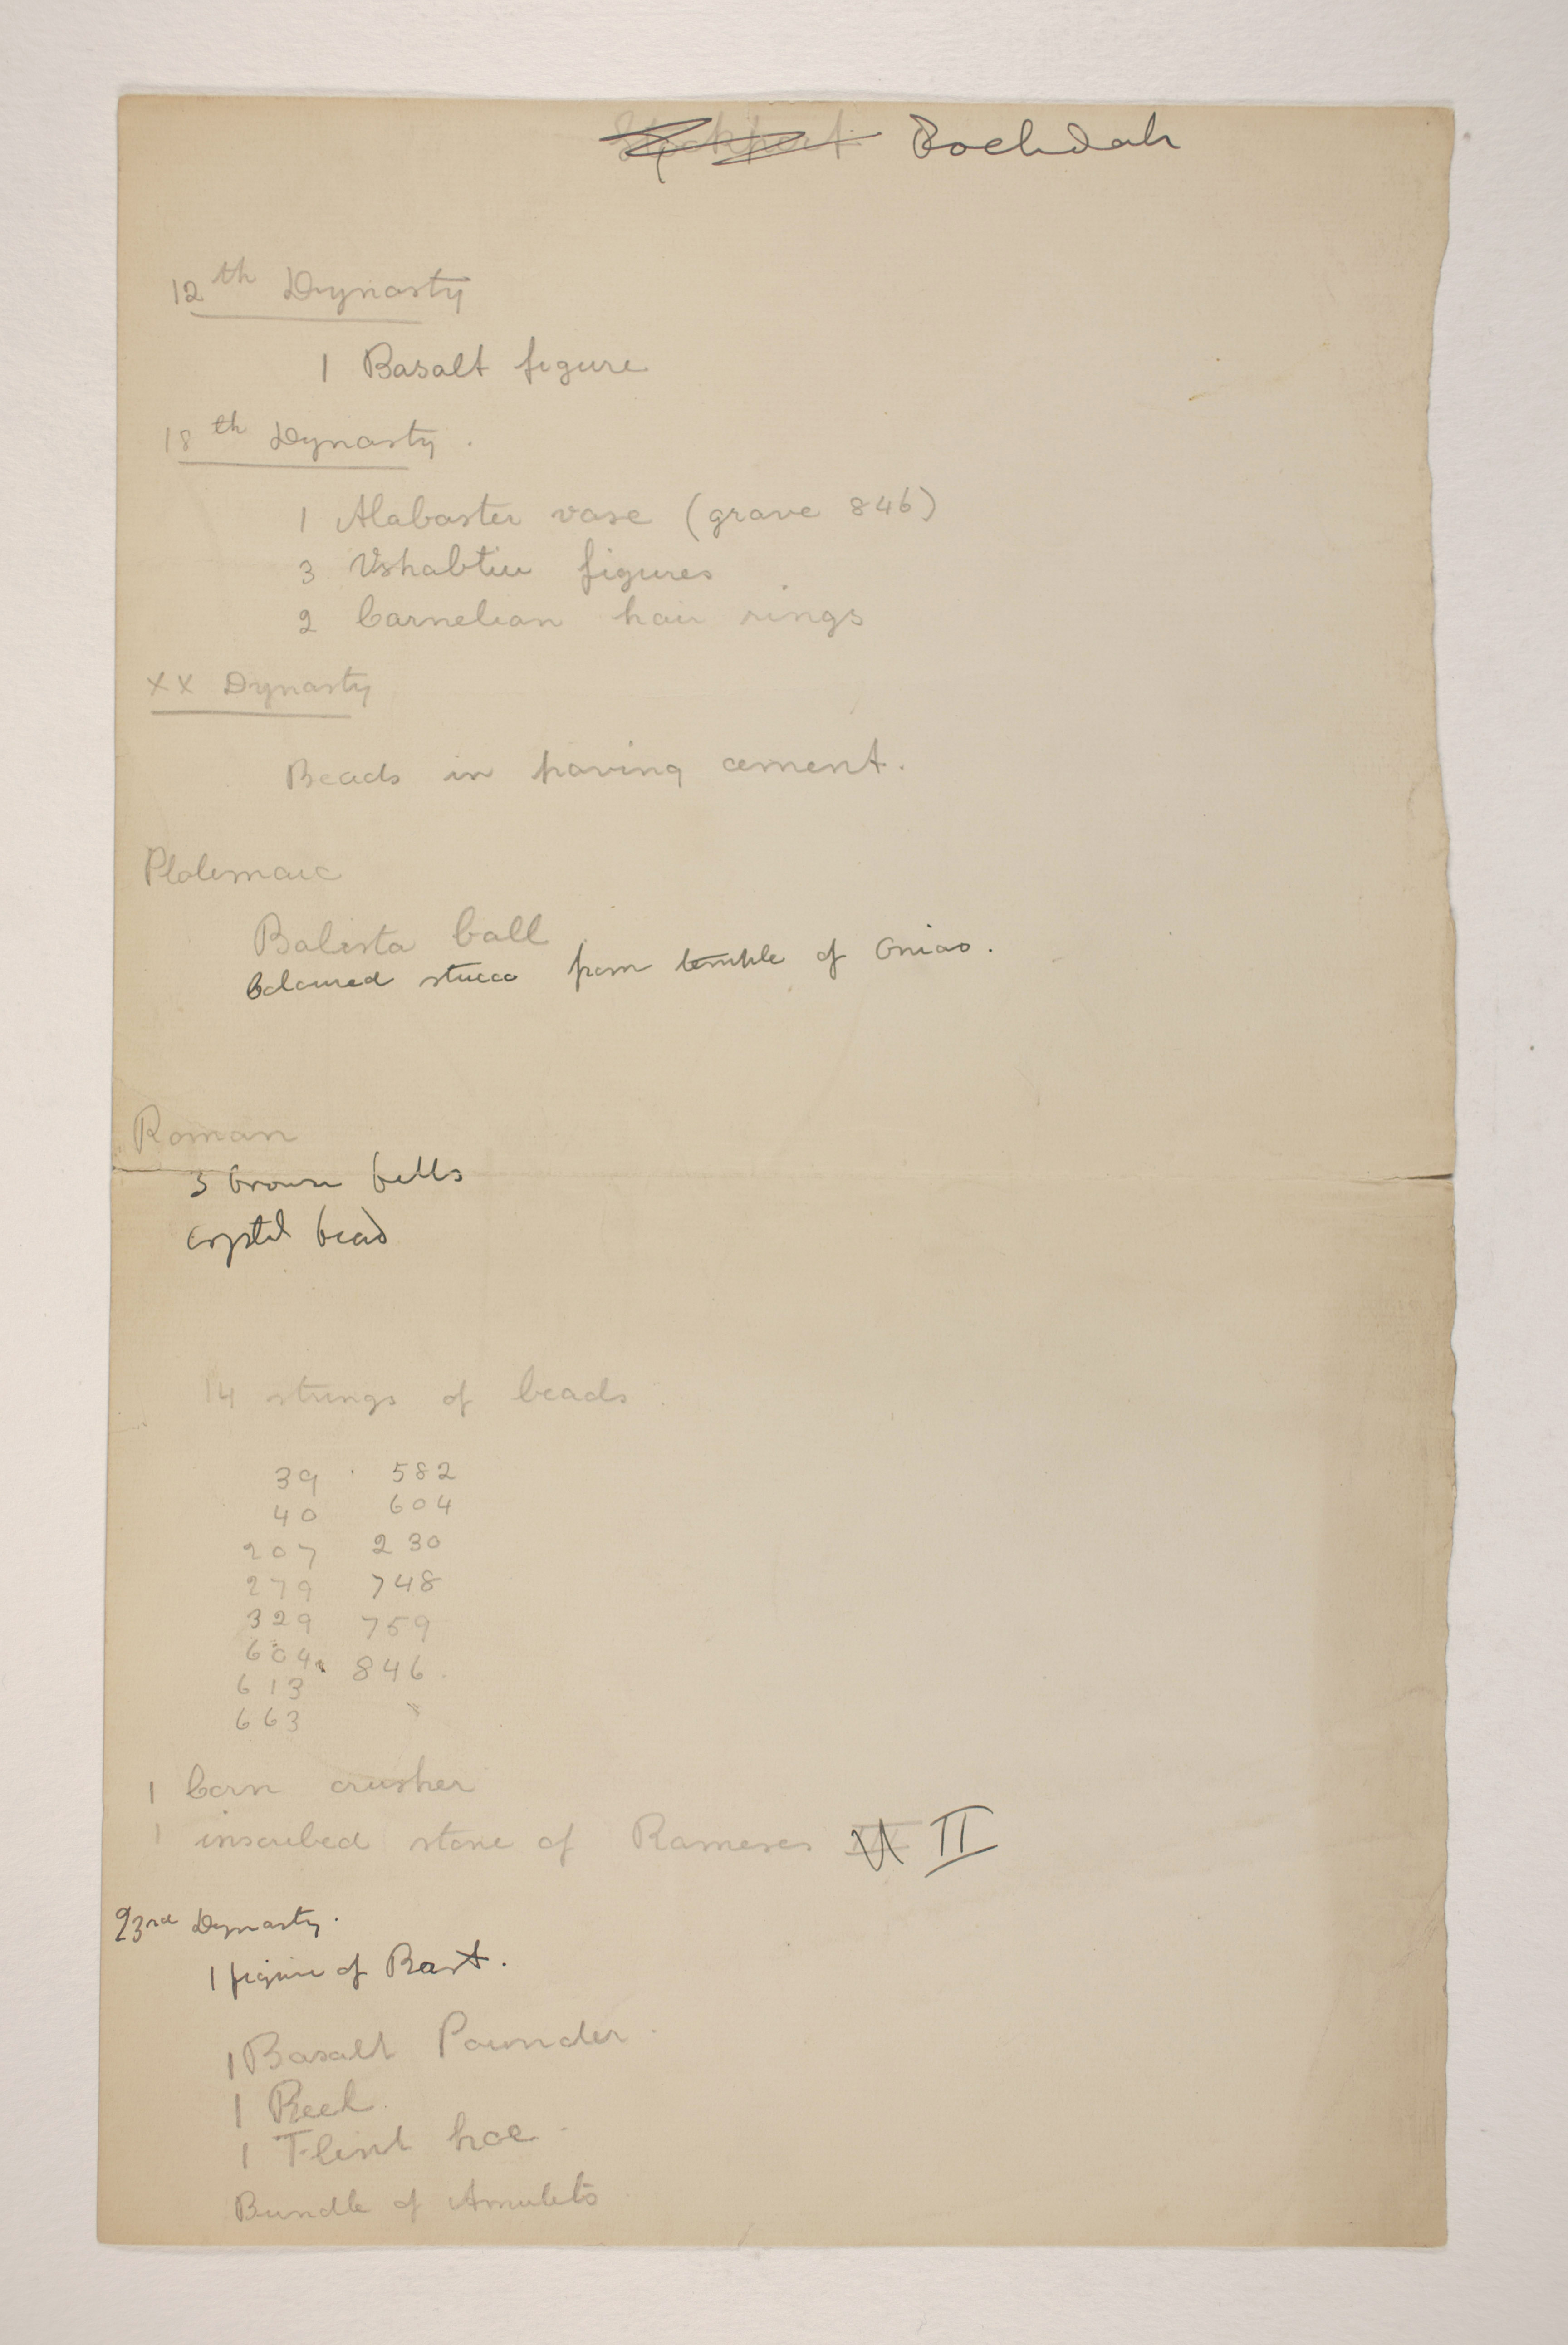 1905-06 Eastern Delta: Belbeis, Tell el-Rataba, Saft el-Hinna, Tell el-Yahudiya, Shaghanbeh, Ghita Individual institution list  PMA/WFP1/D/14/26